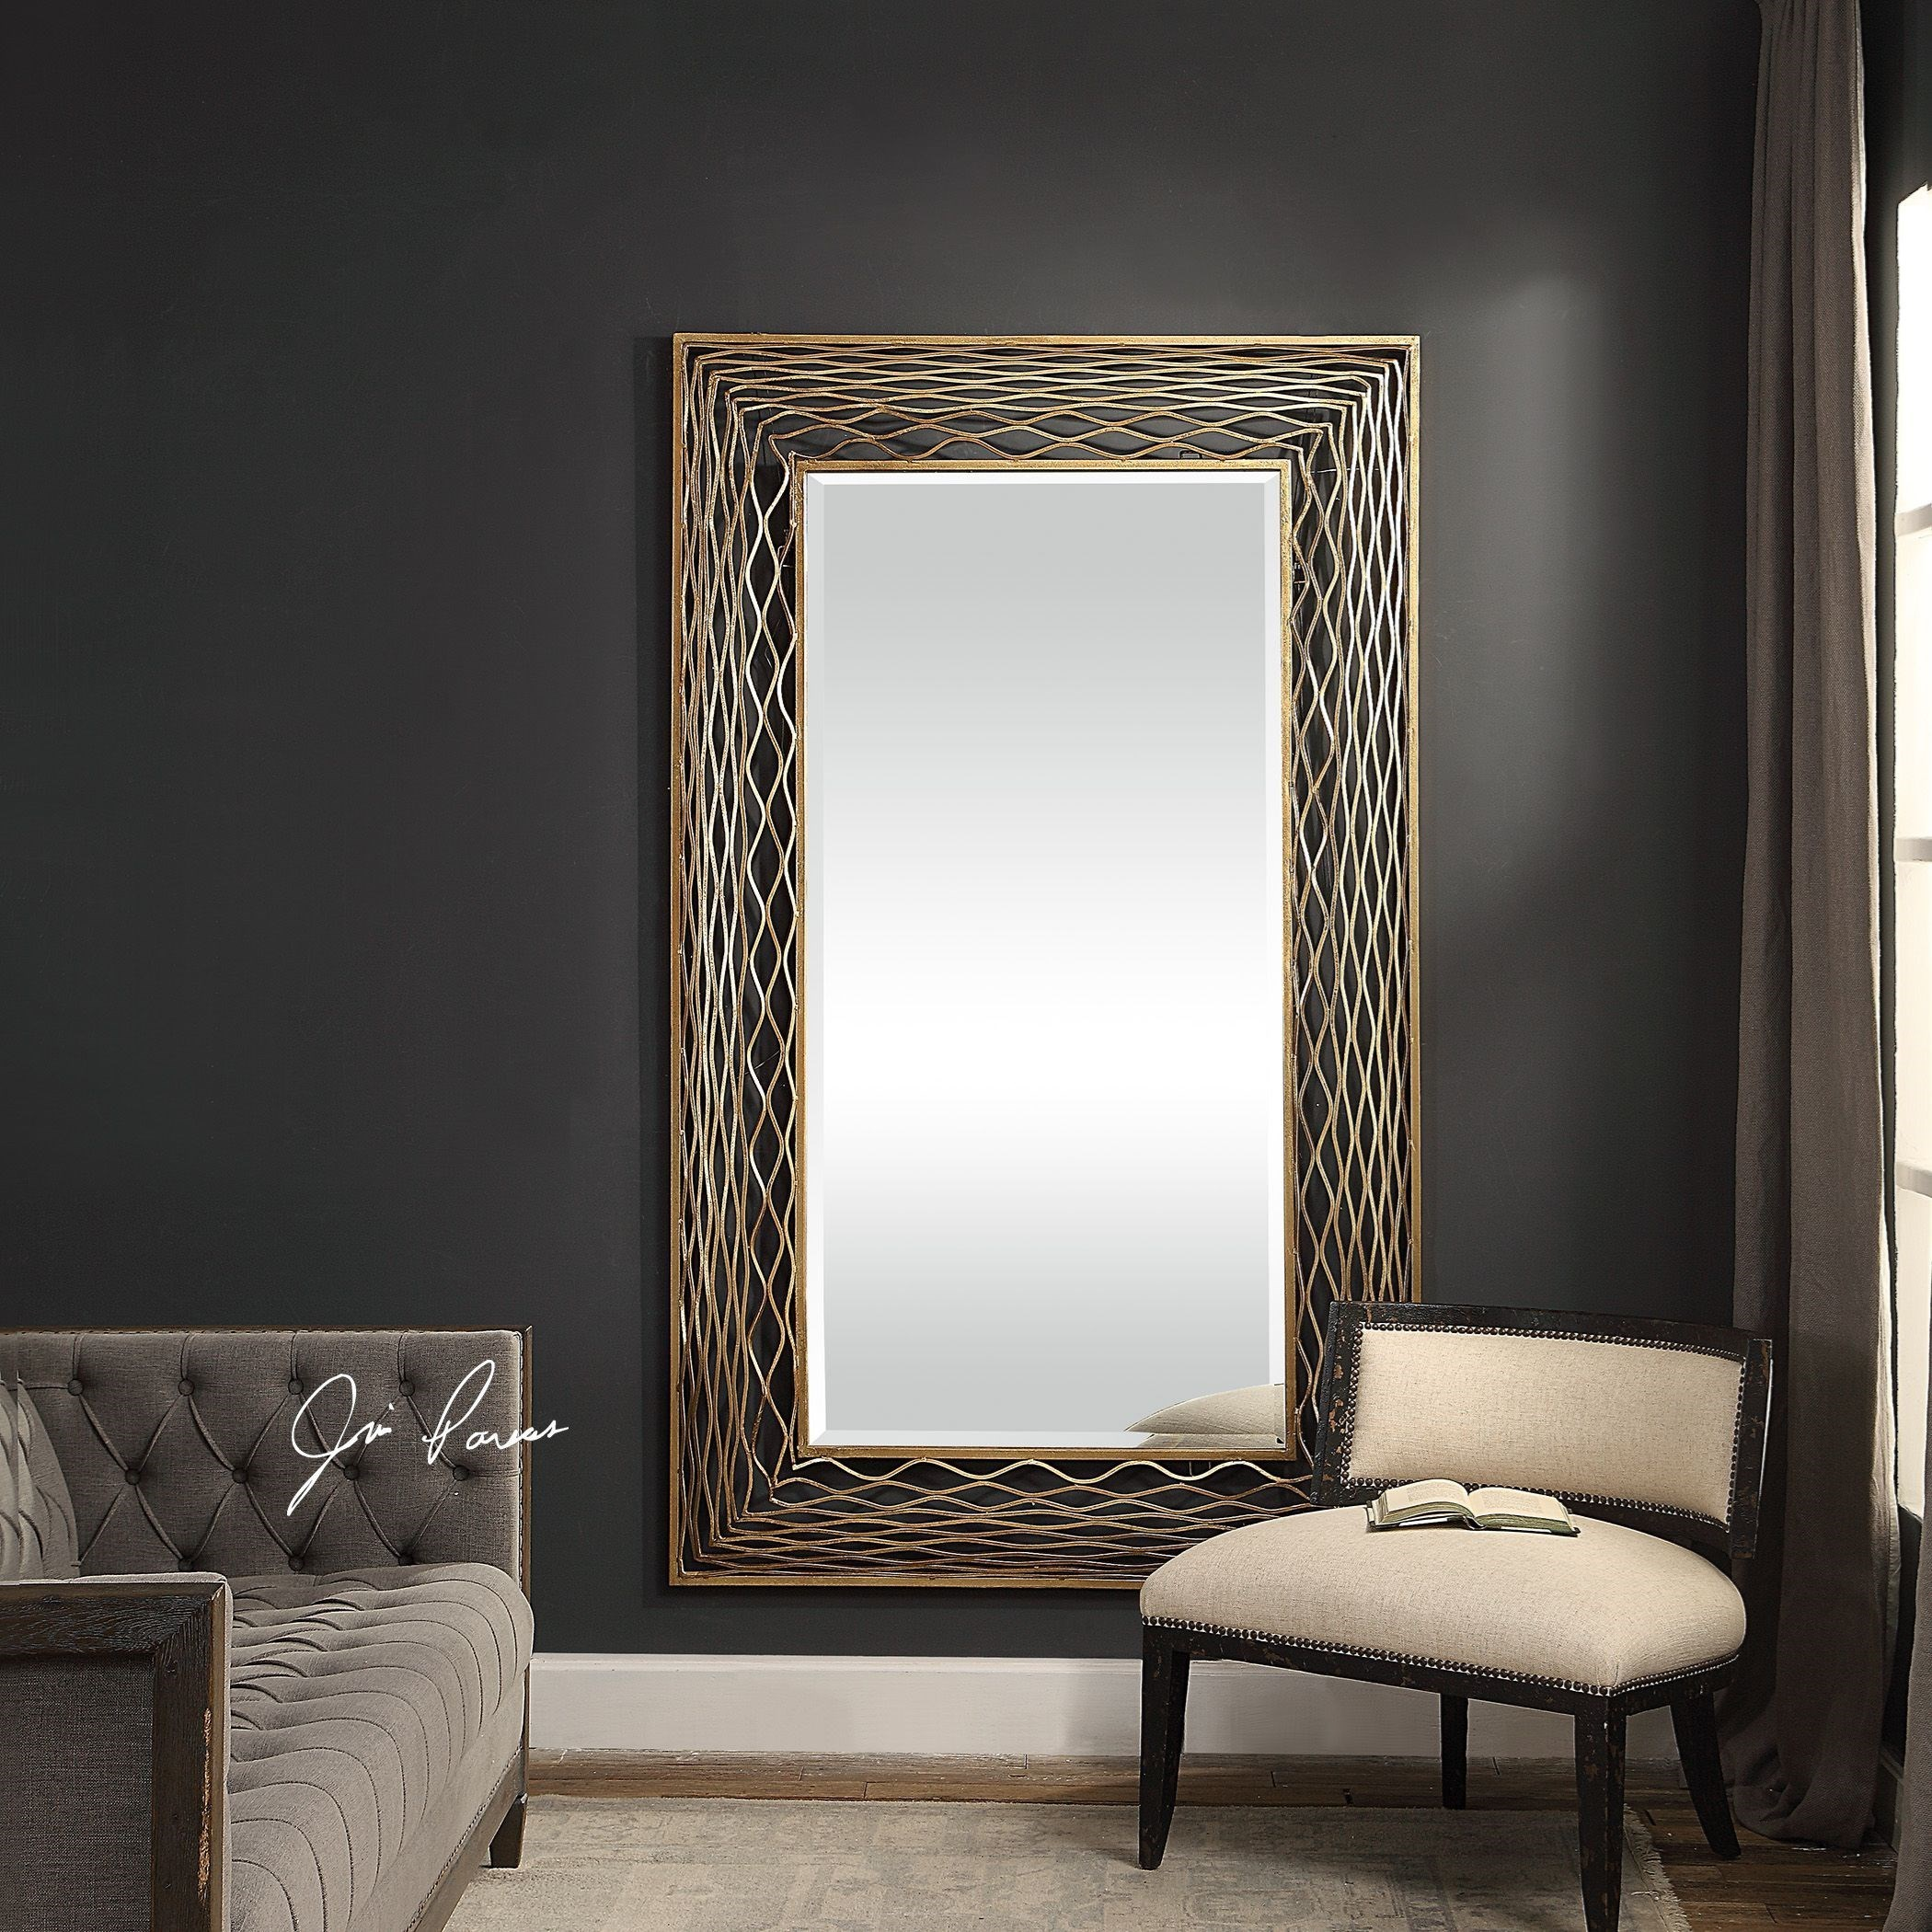 Vivian Wall Mirror By Uttermost: Uttermost Mirrors 09414 Galtero Rectangle Gold Mirror